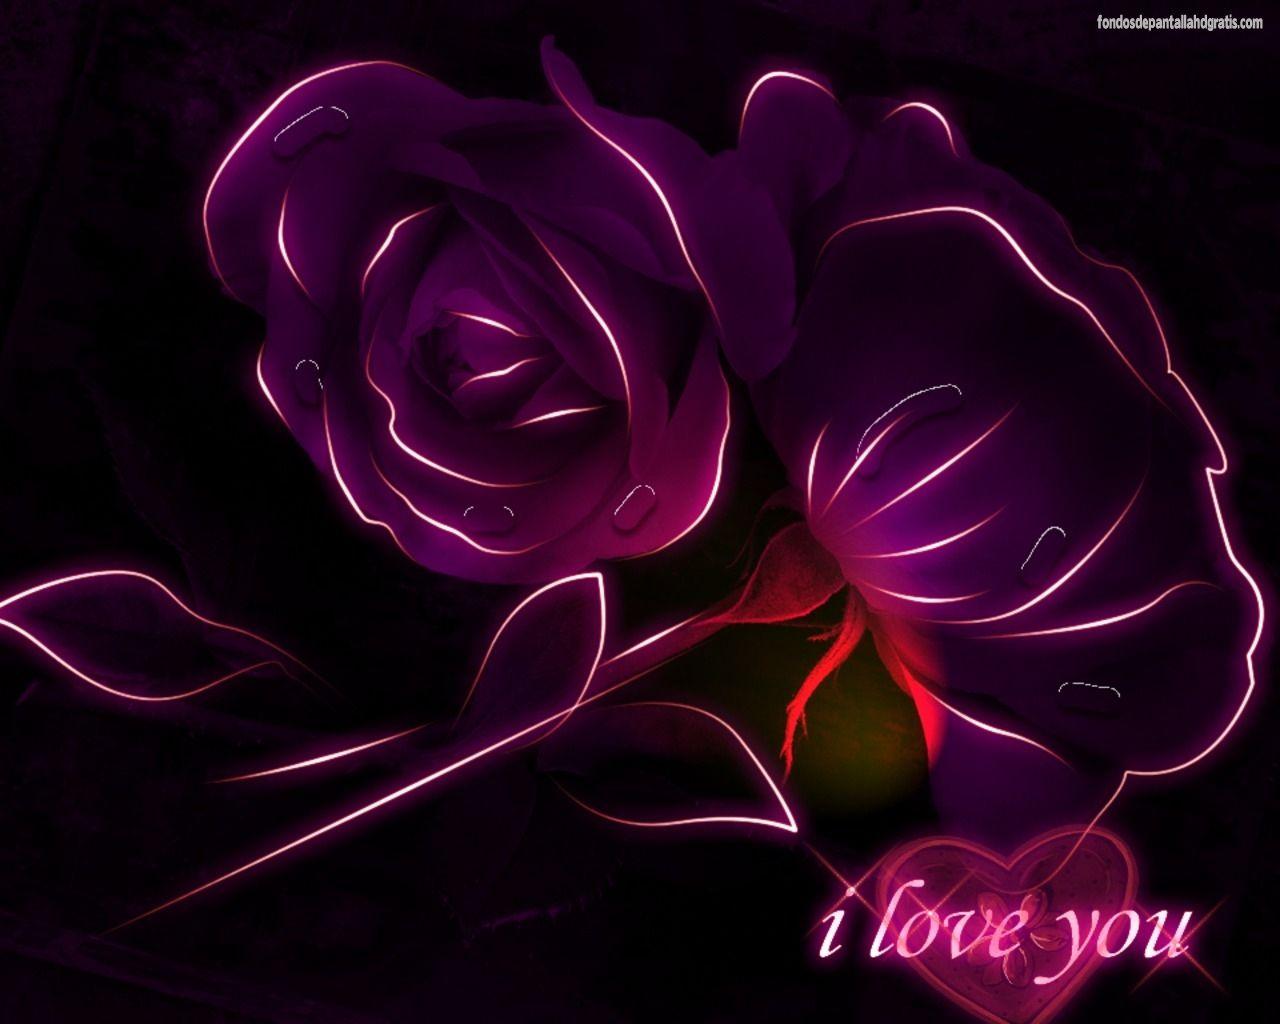 Corazones Moviendose En Hd Para Descargar Gratis 5 Flowers Rose Flower Images